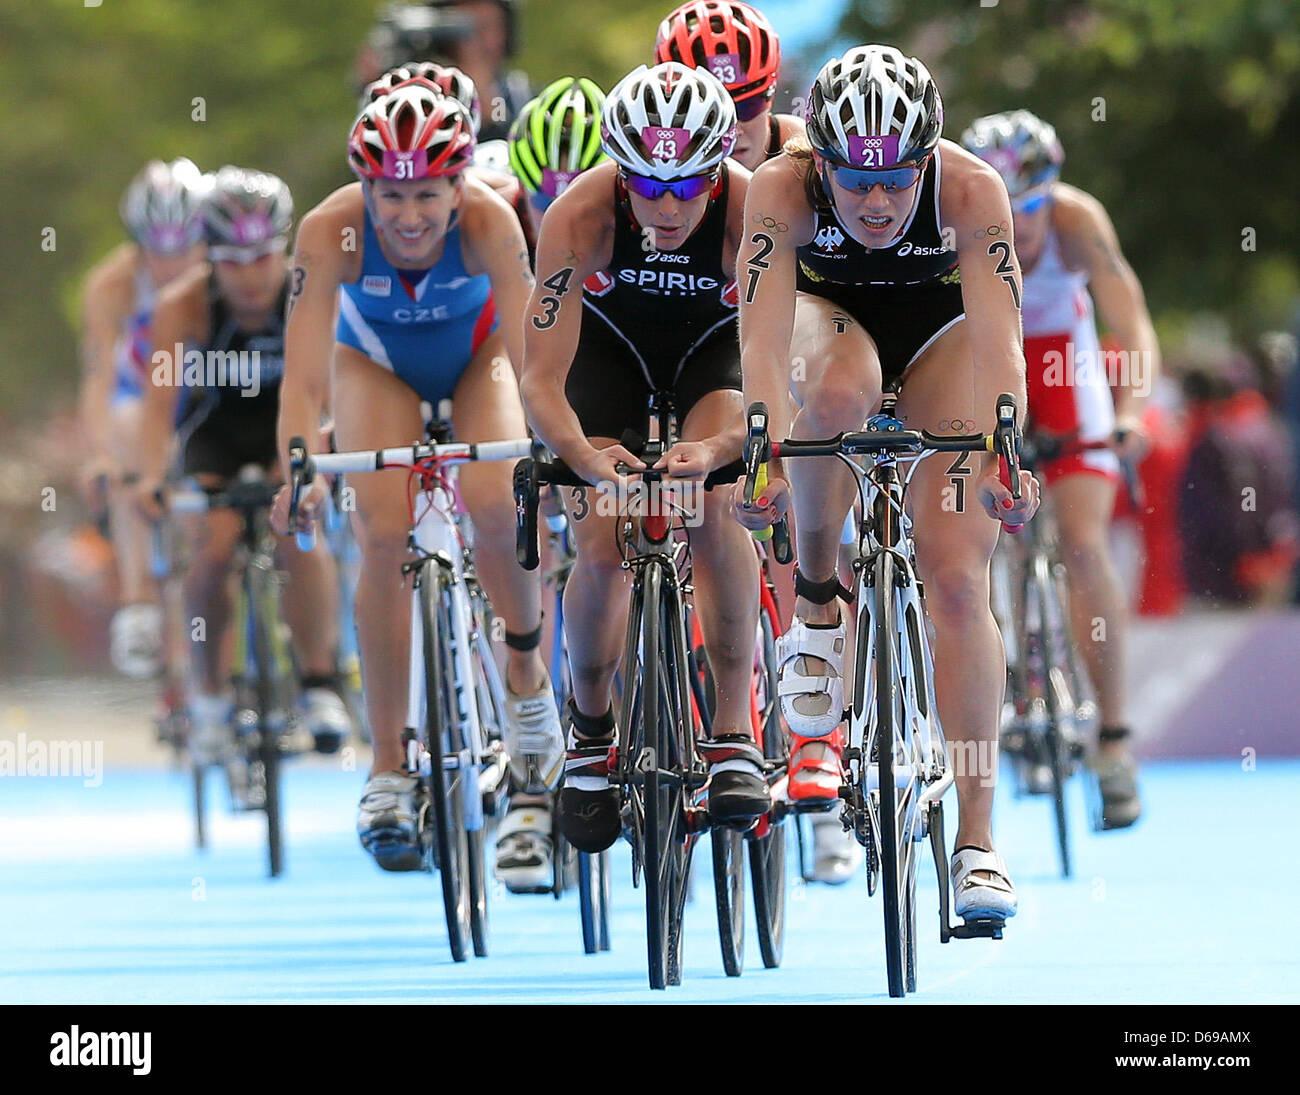 Germany's Svenja Bazlen (R) and Switzerland's Nicola Spirig (C) compete in the Women's Triathlon during - Stock Image